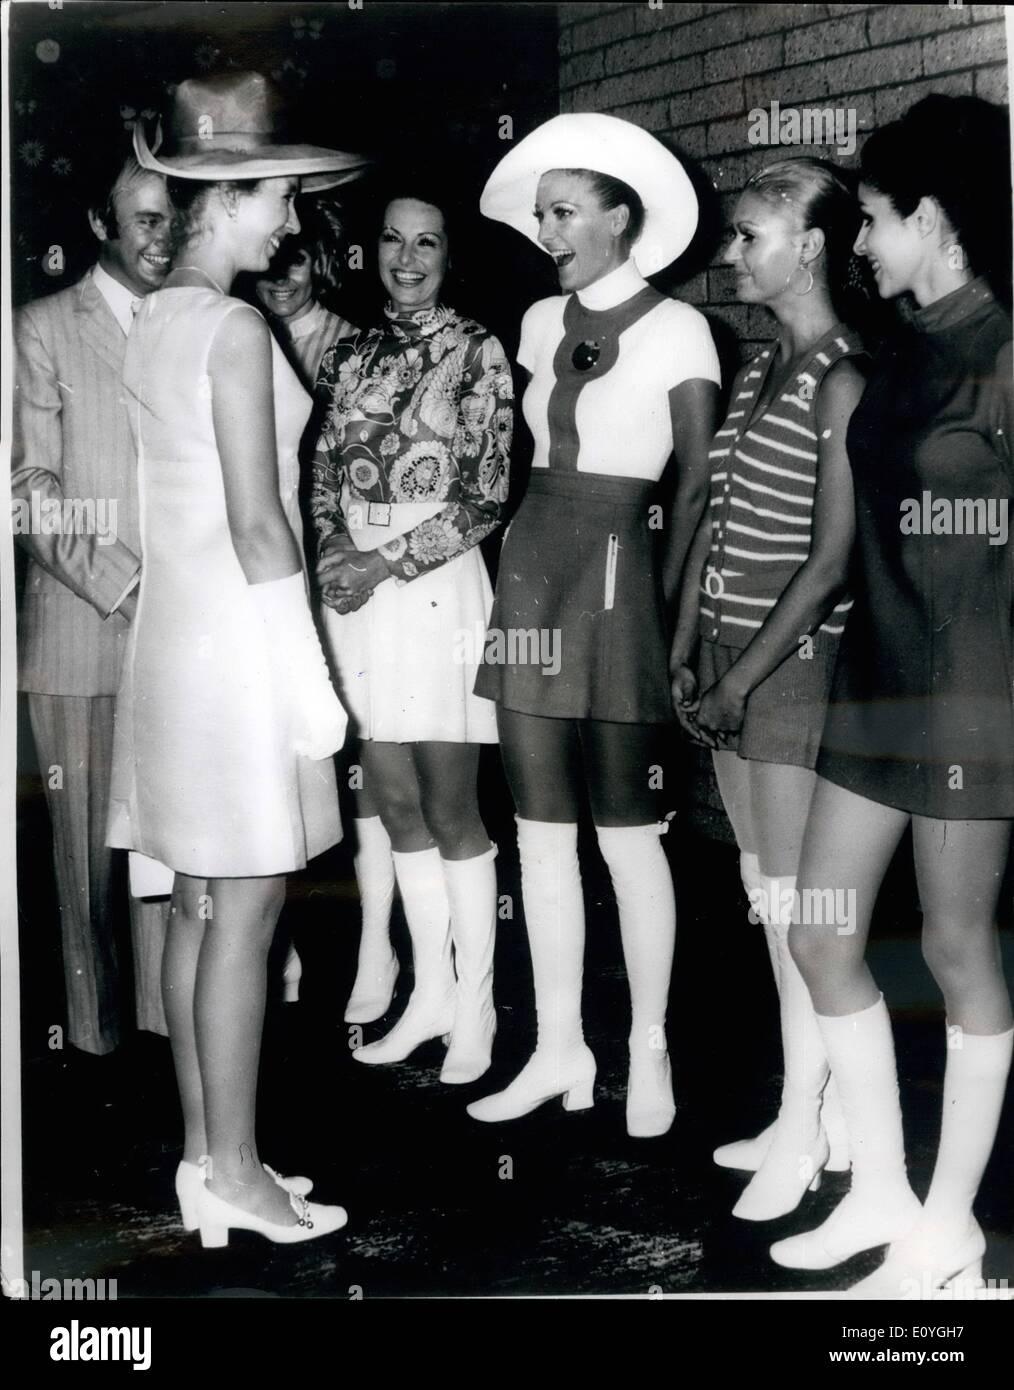 Abril 20, 1970 - Abril 20th, 1970 la princesa Ana en Ultra-Modern Fashion Show. La Princesa Ana gozó de mayor participación Foto de stock